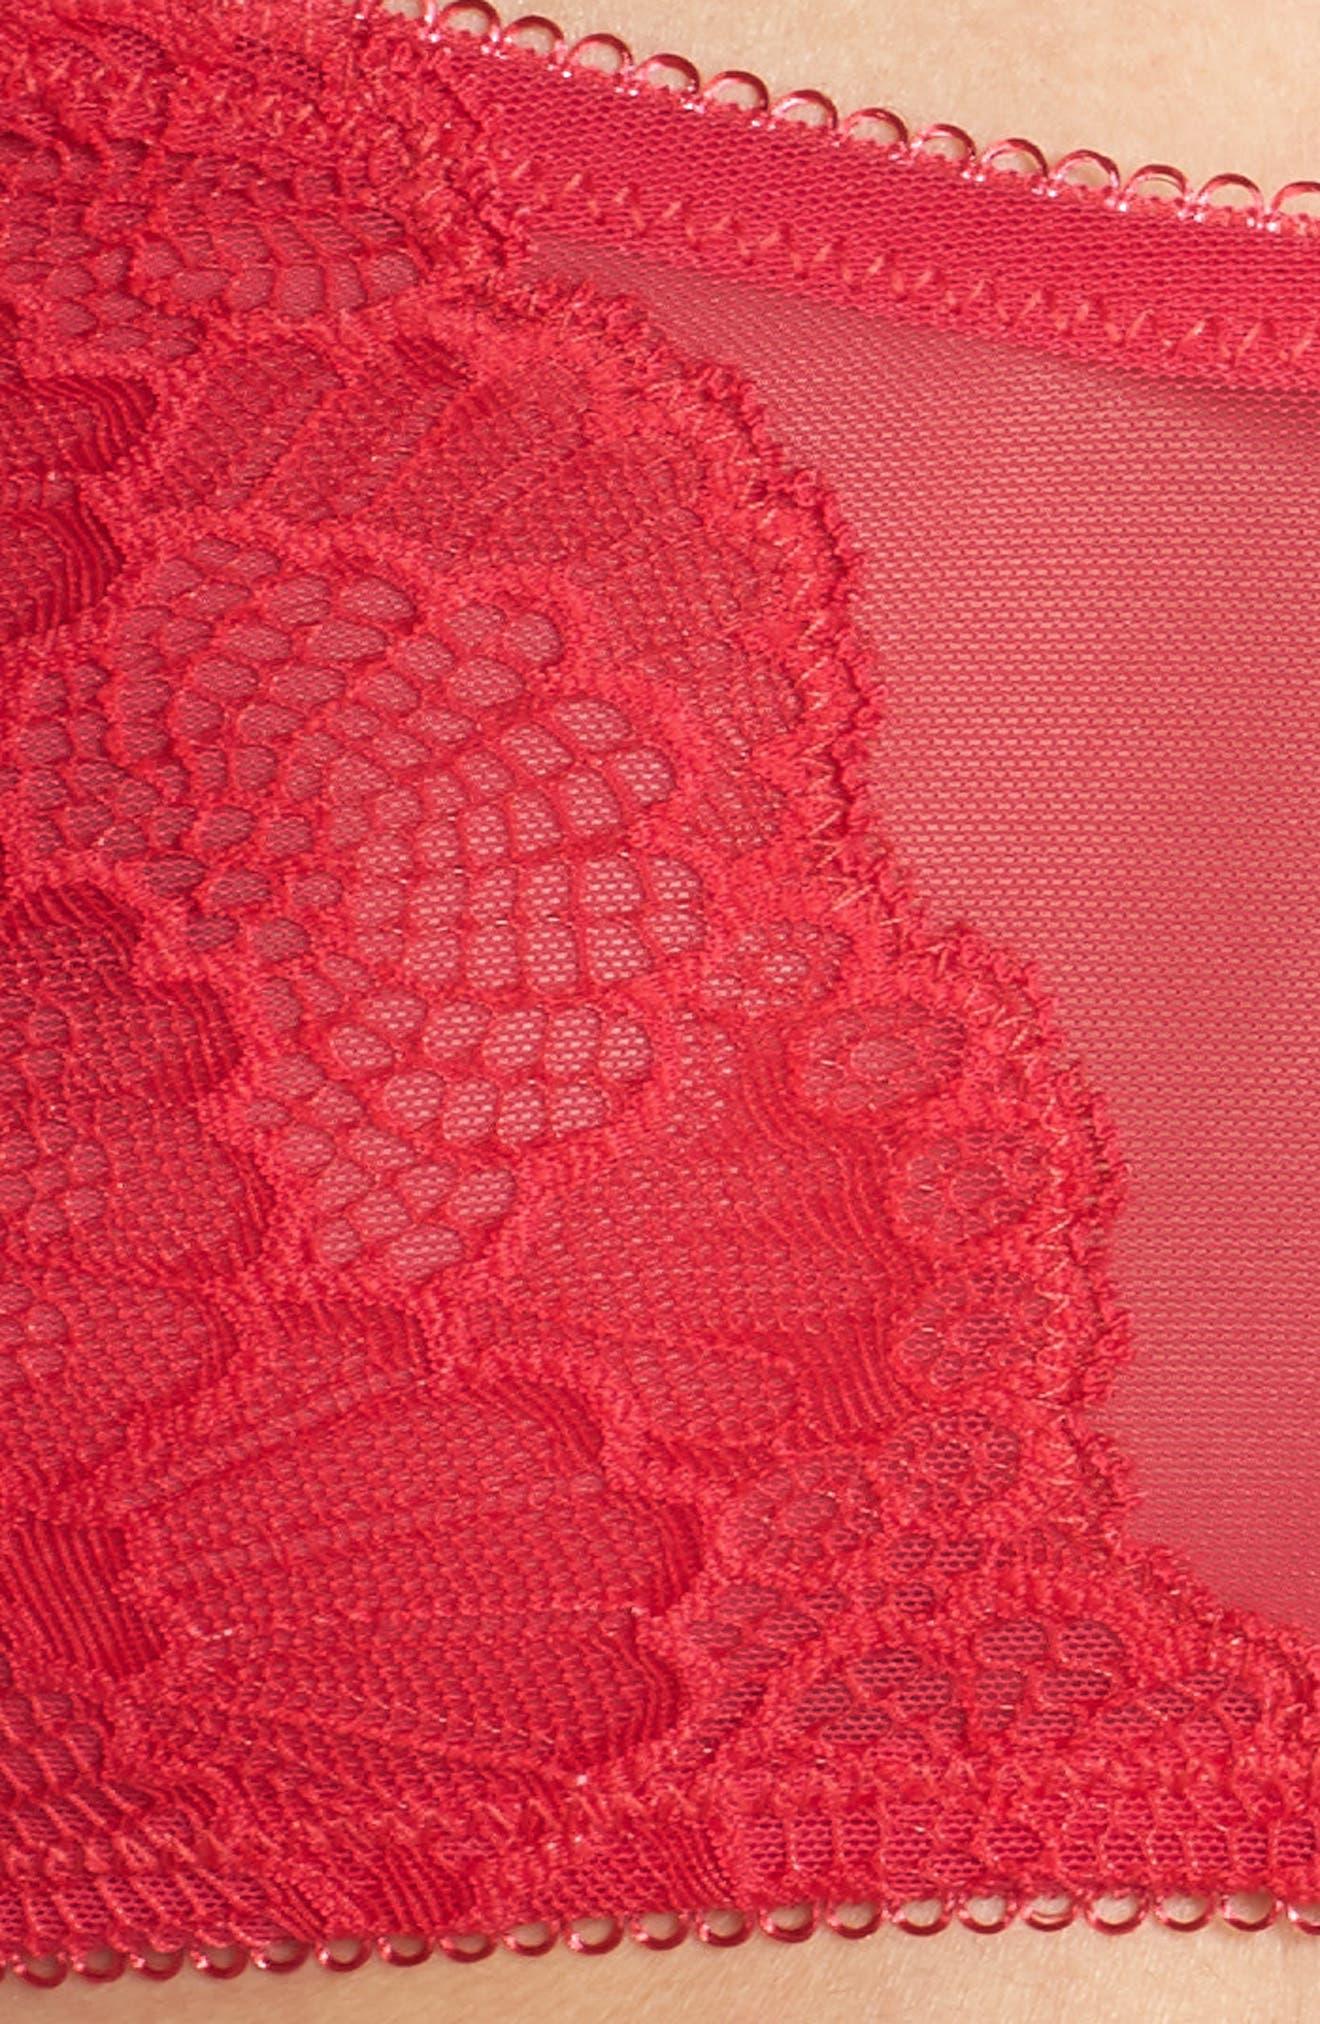 Intimately FP Malinda Bandeau Bra,                             Alternate thumbnail 7, color,                             Raspberry